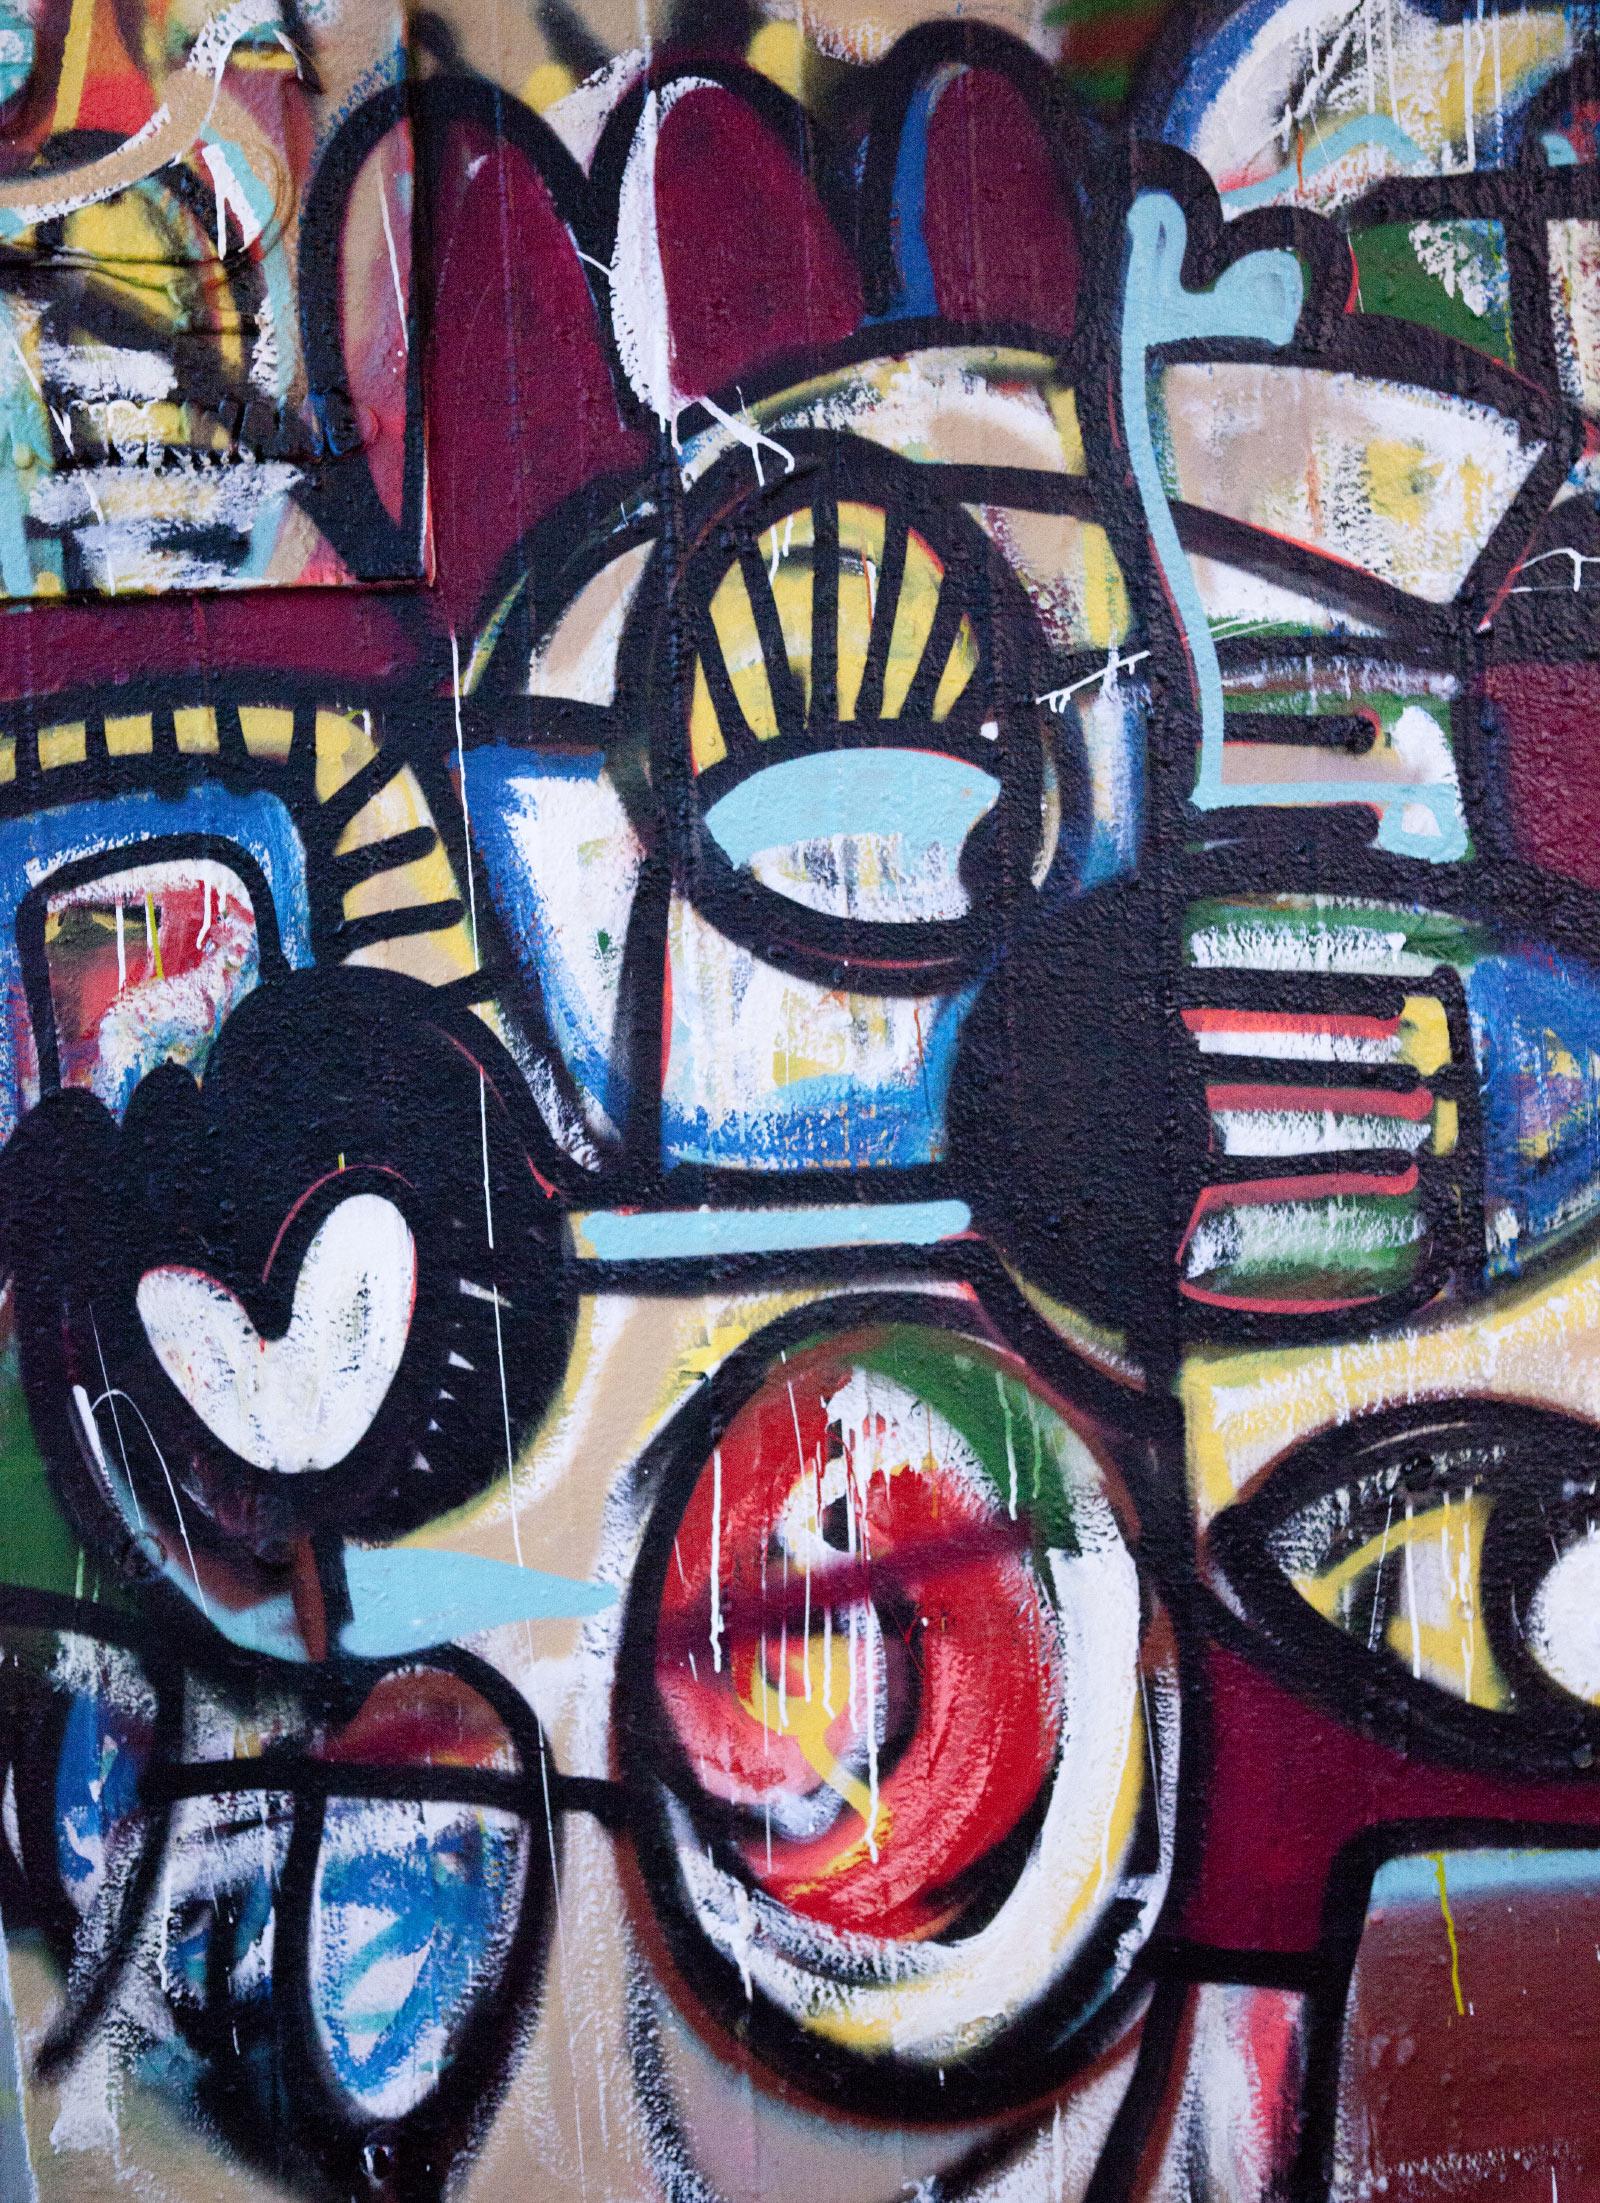 Rob_Adalierd_Painting_Vienna_Abstract_Contemporary_Street_art_thumb_2.jpg